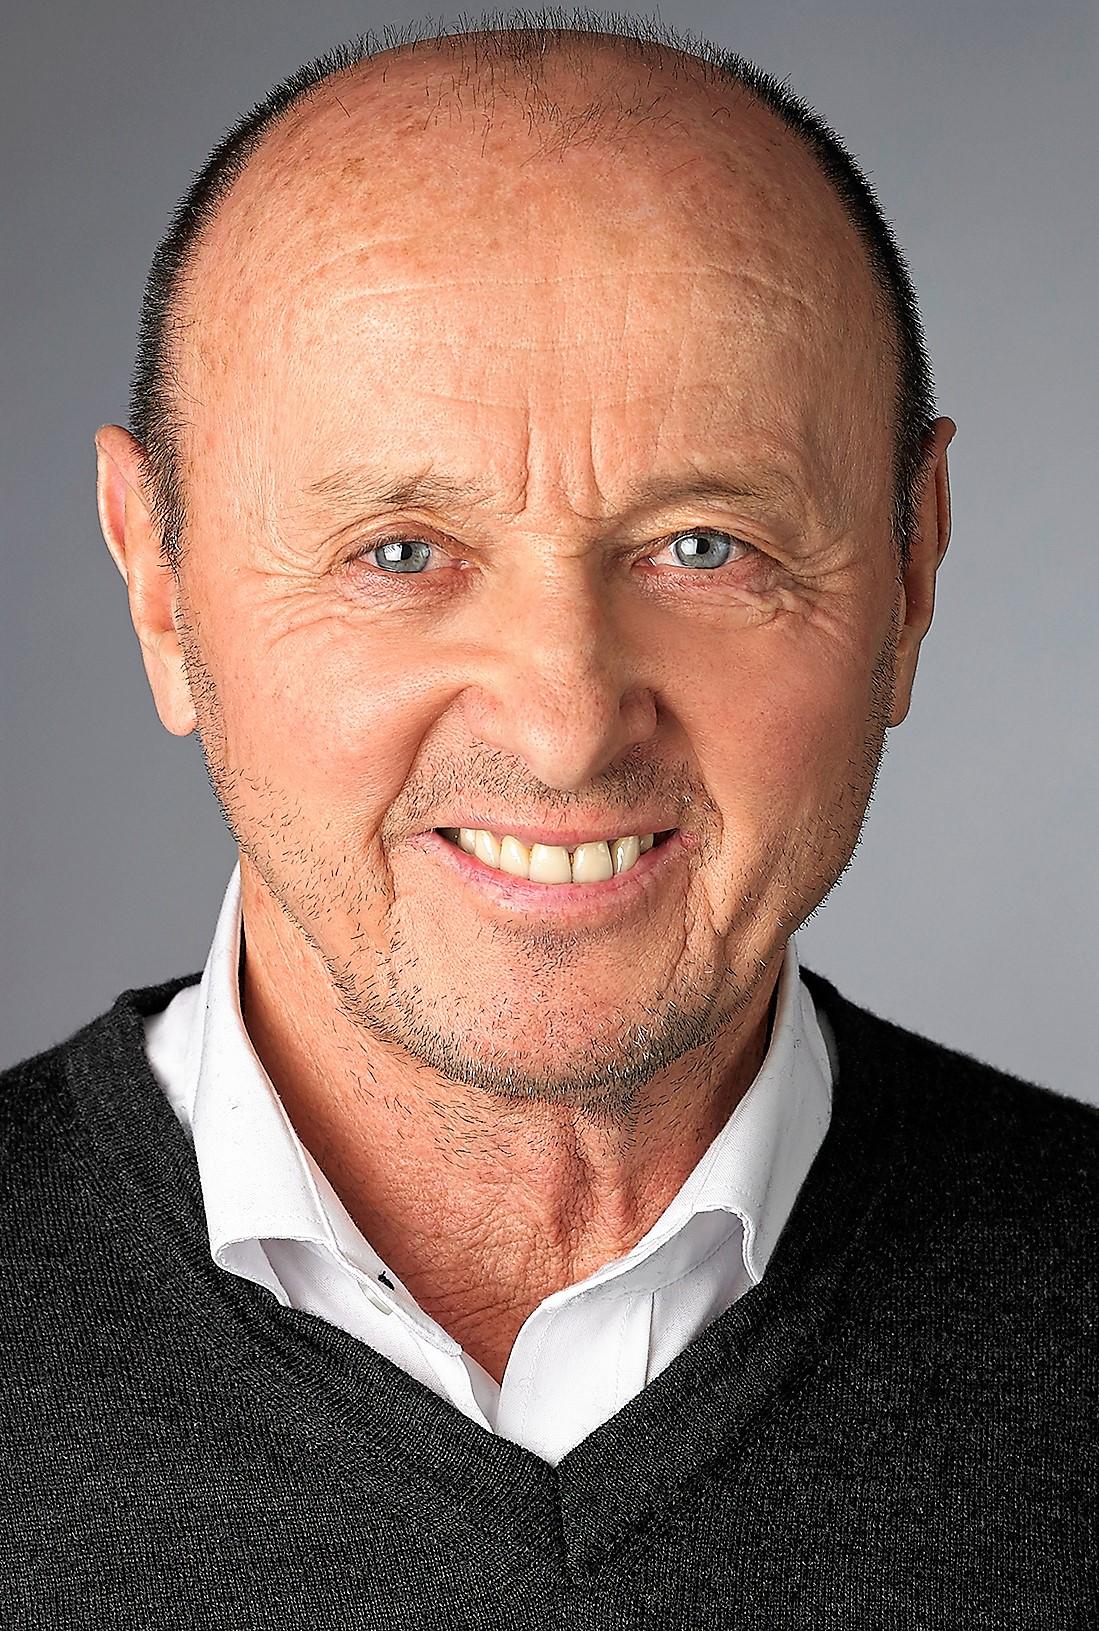 Walter Rotter